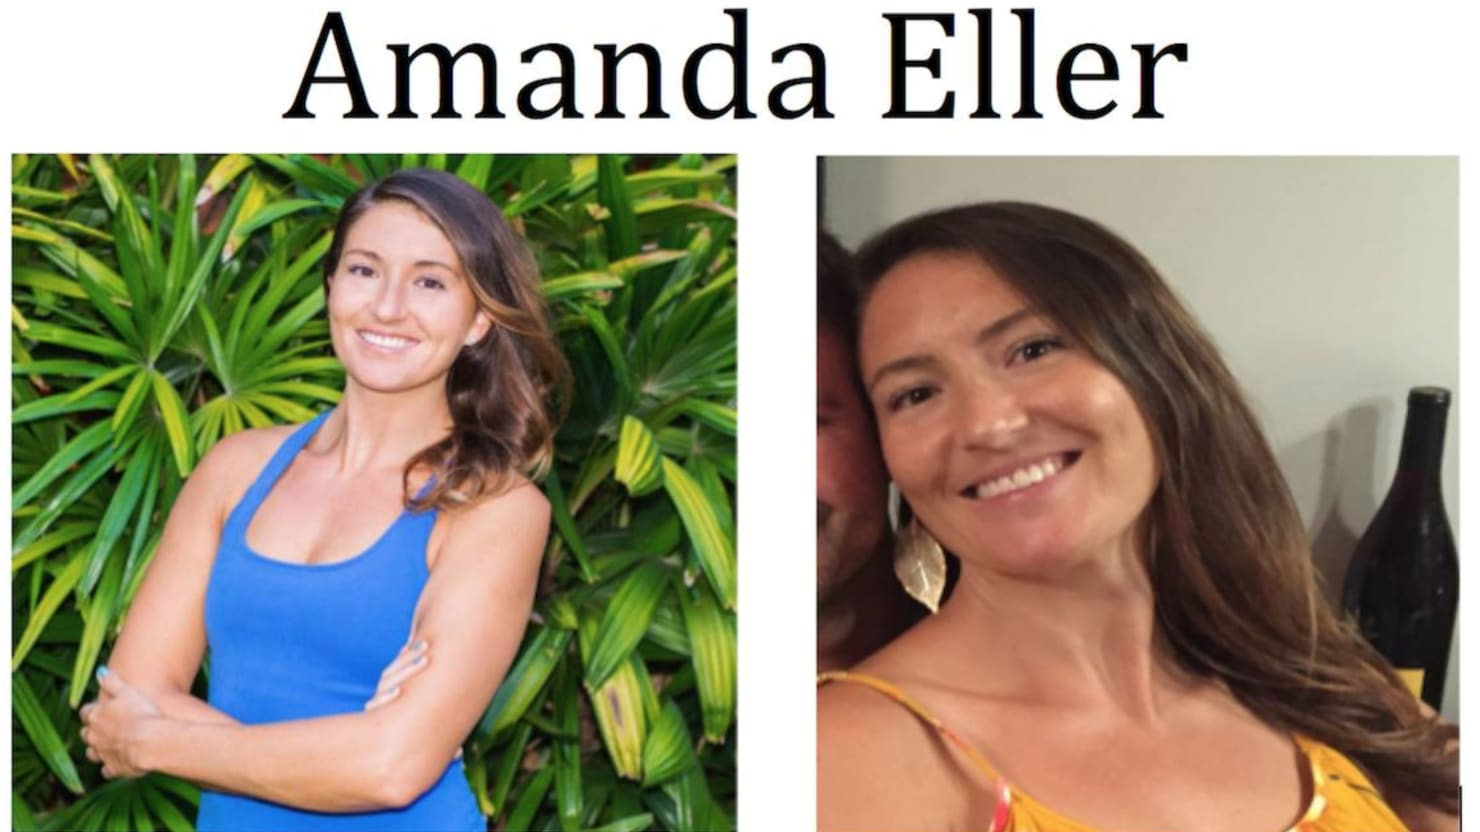 Yoga Teacher Amanda Eller Founda Alive in Hawaiian Ravine